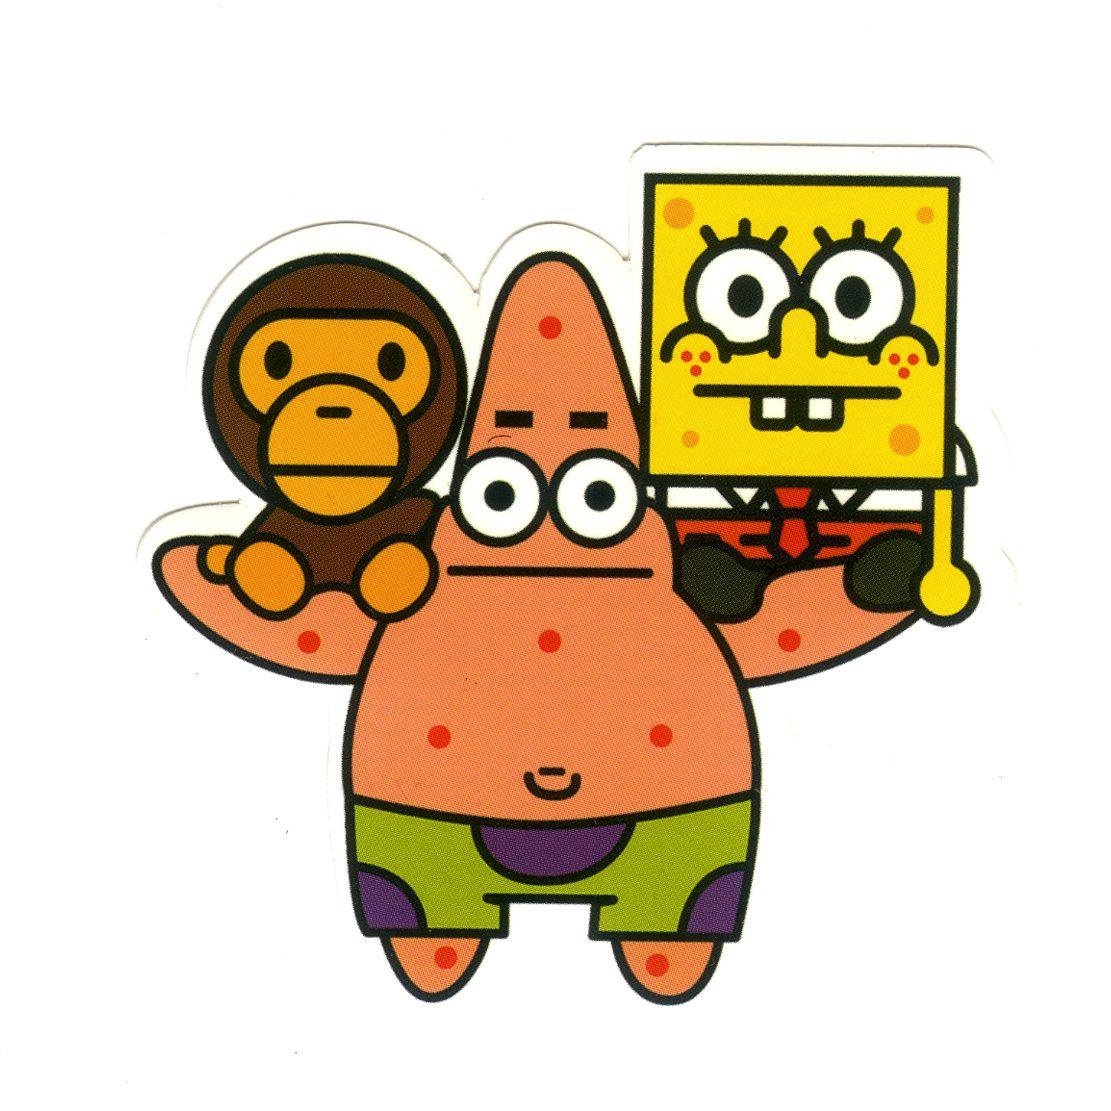 1198 Patrick Star X Baby Milo X Spongebob Height 6 Cm Decal Sticker Decalstar Com Graffiti Characters Spongebob Spongebob Wallpaper